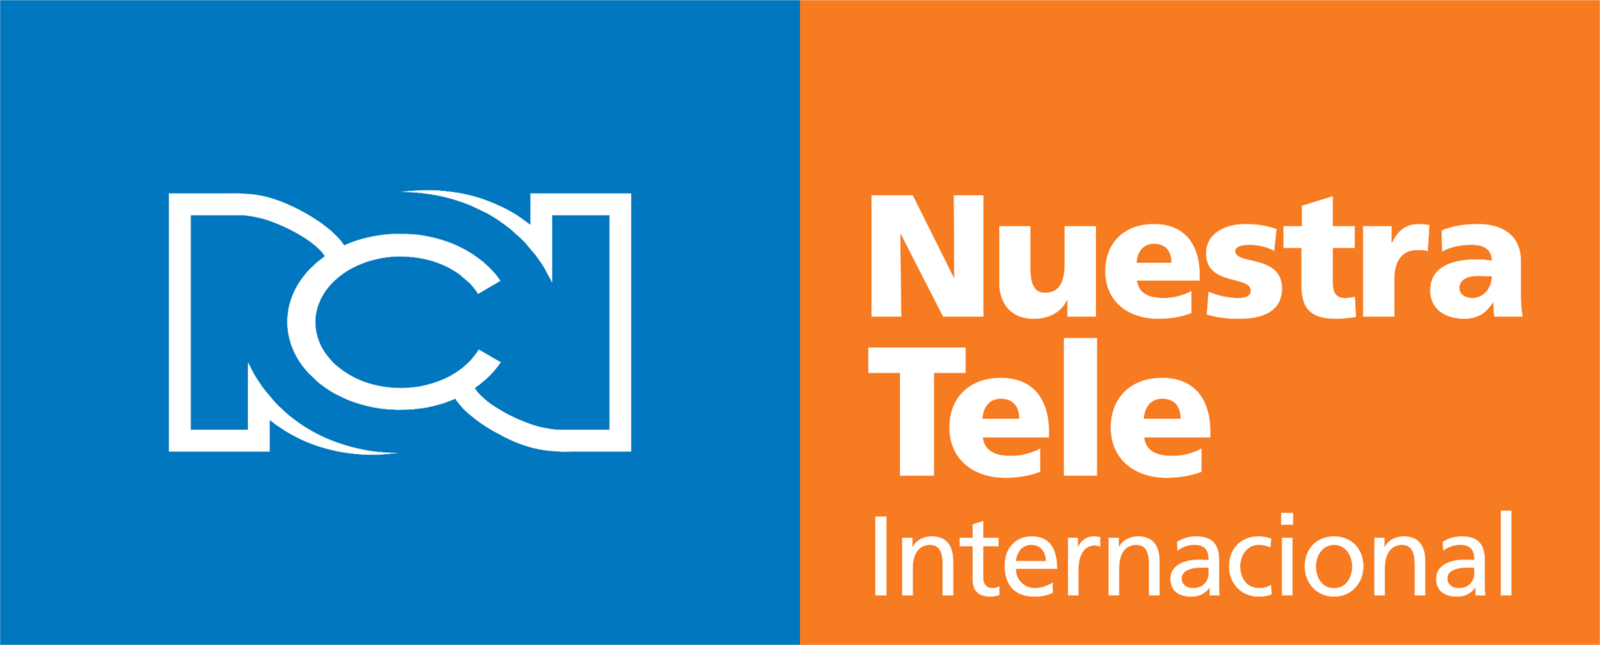 RCN Nuestra Tele Internacional - Wikiwand